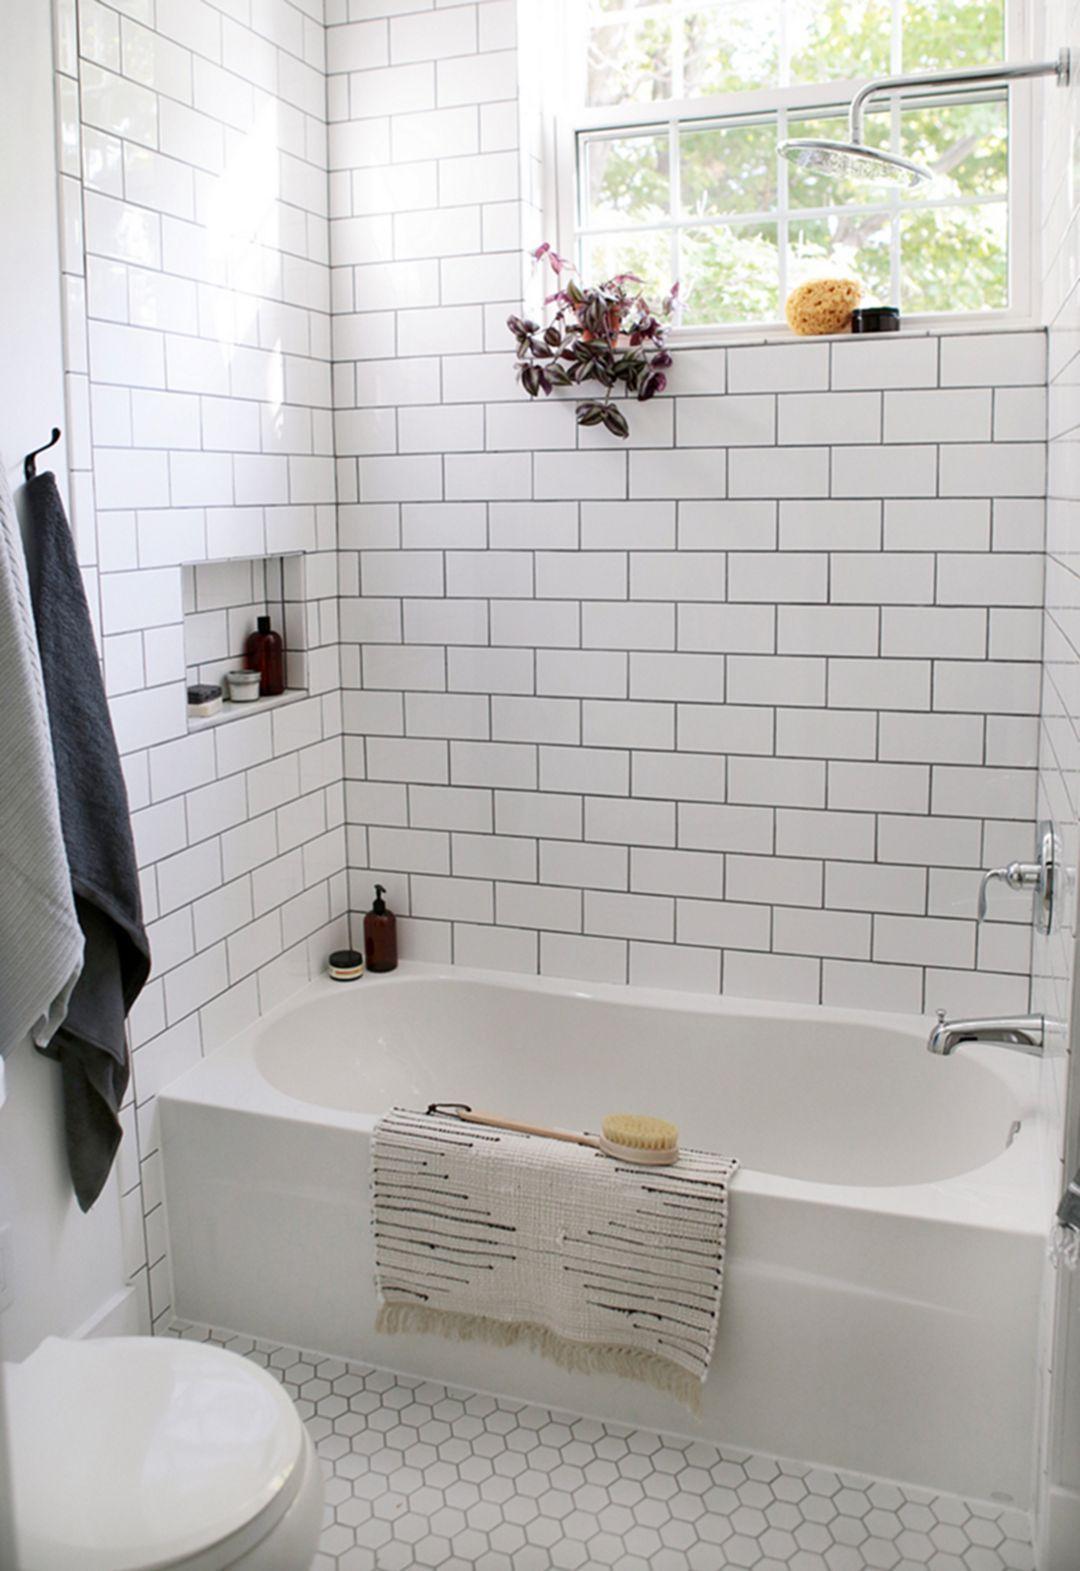 Cheap Bathroom Shower Ideas For Small Bathroom 182 Bathrooms Remodel Small Farmhouse Bathroom Bathroom Remodel Master